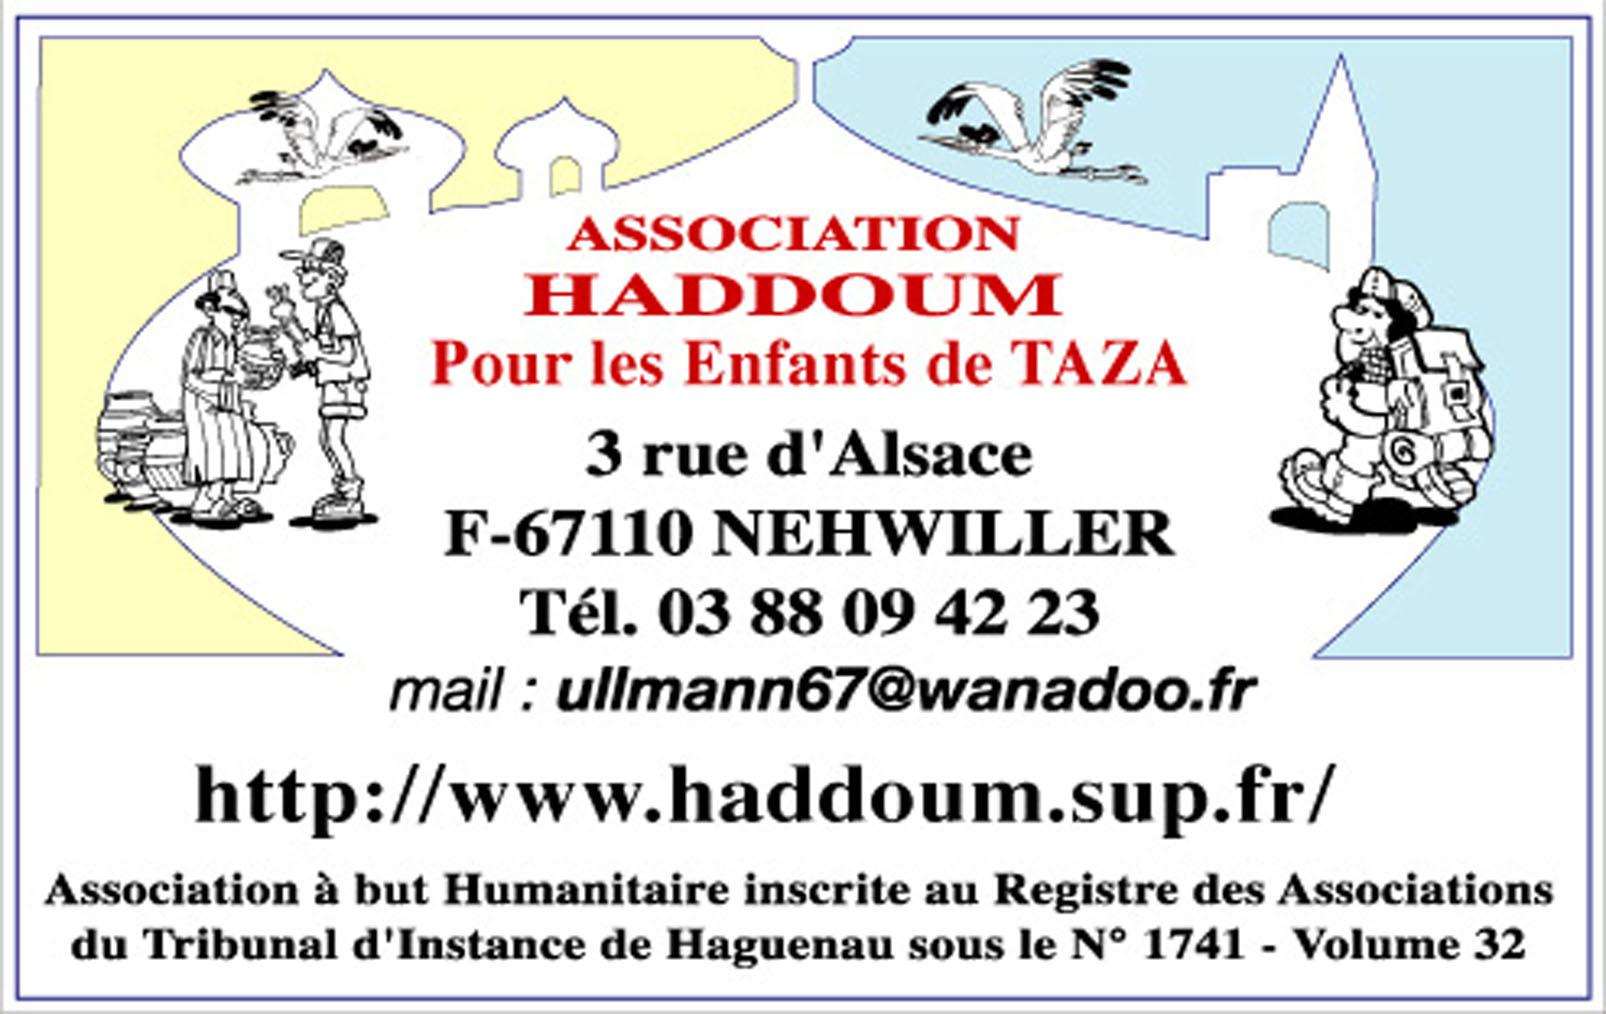 HADDOUM CARTE DE VISITE